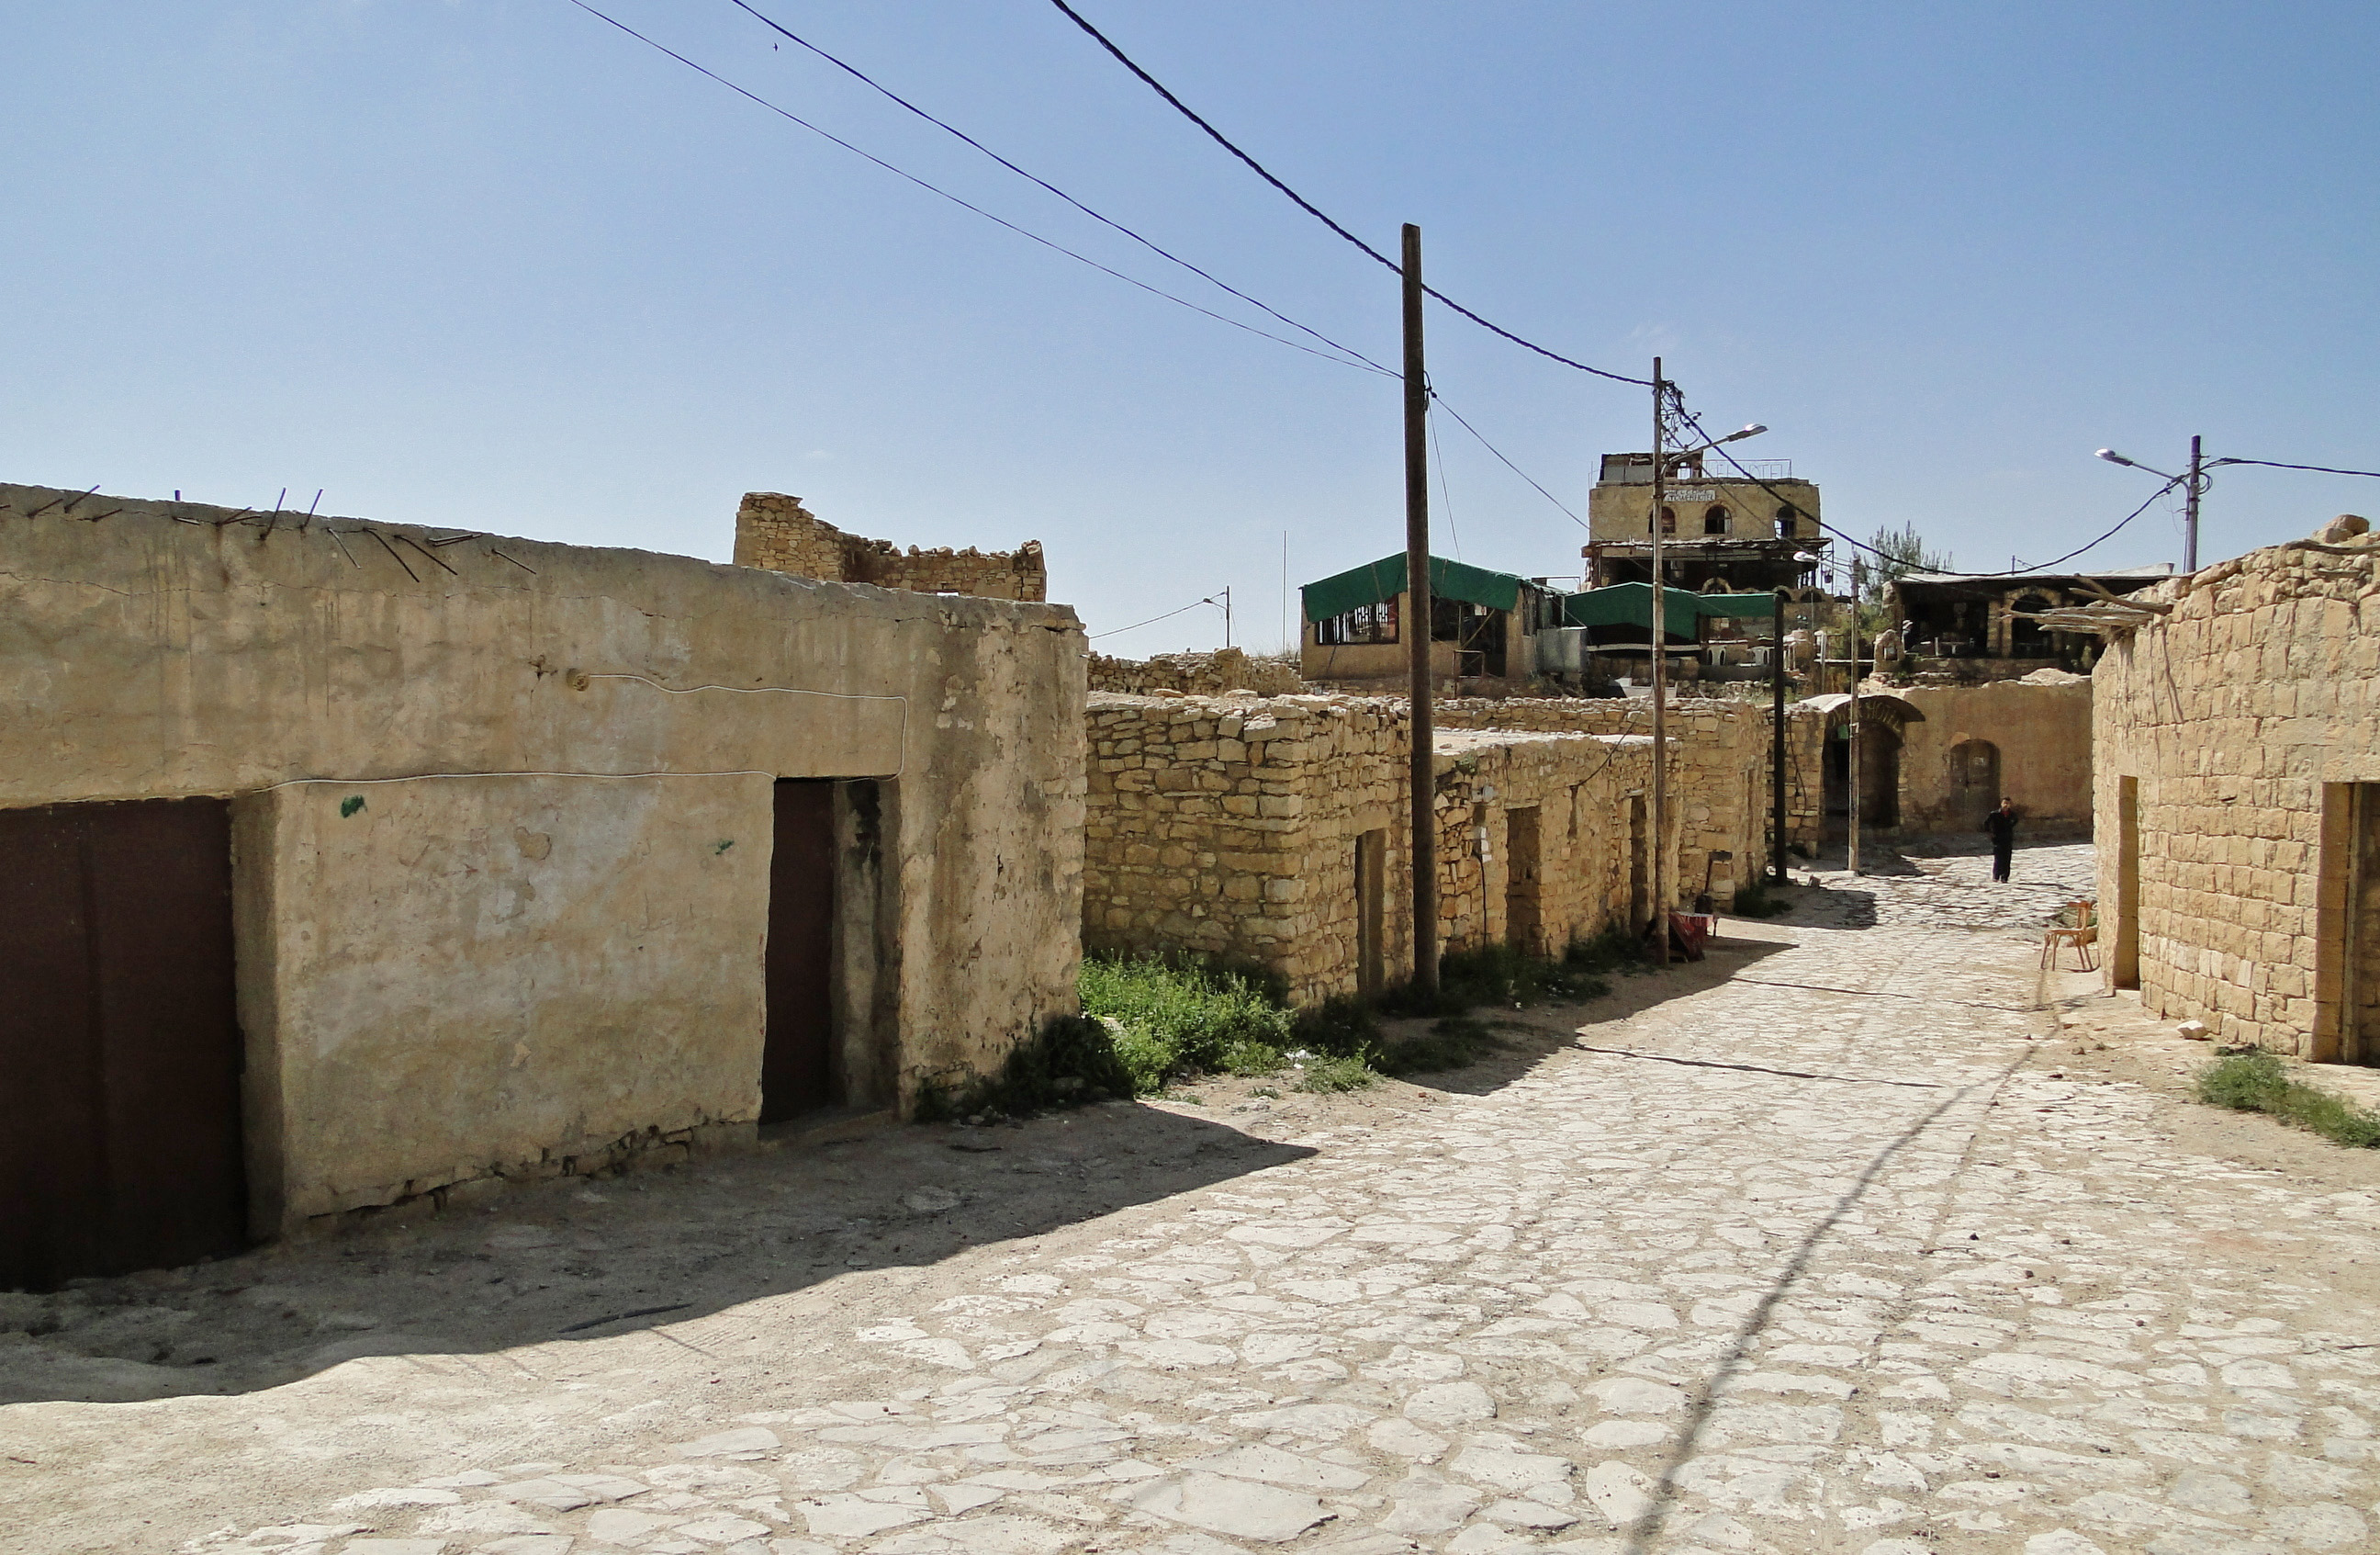 File:Dana village, Jordan 02.jpg - Wikimedia Commonsjordan village